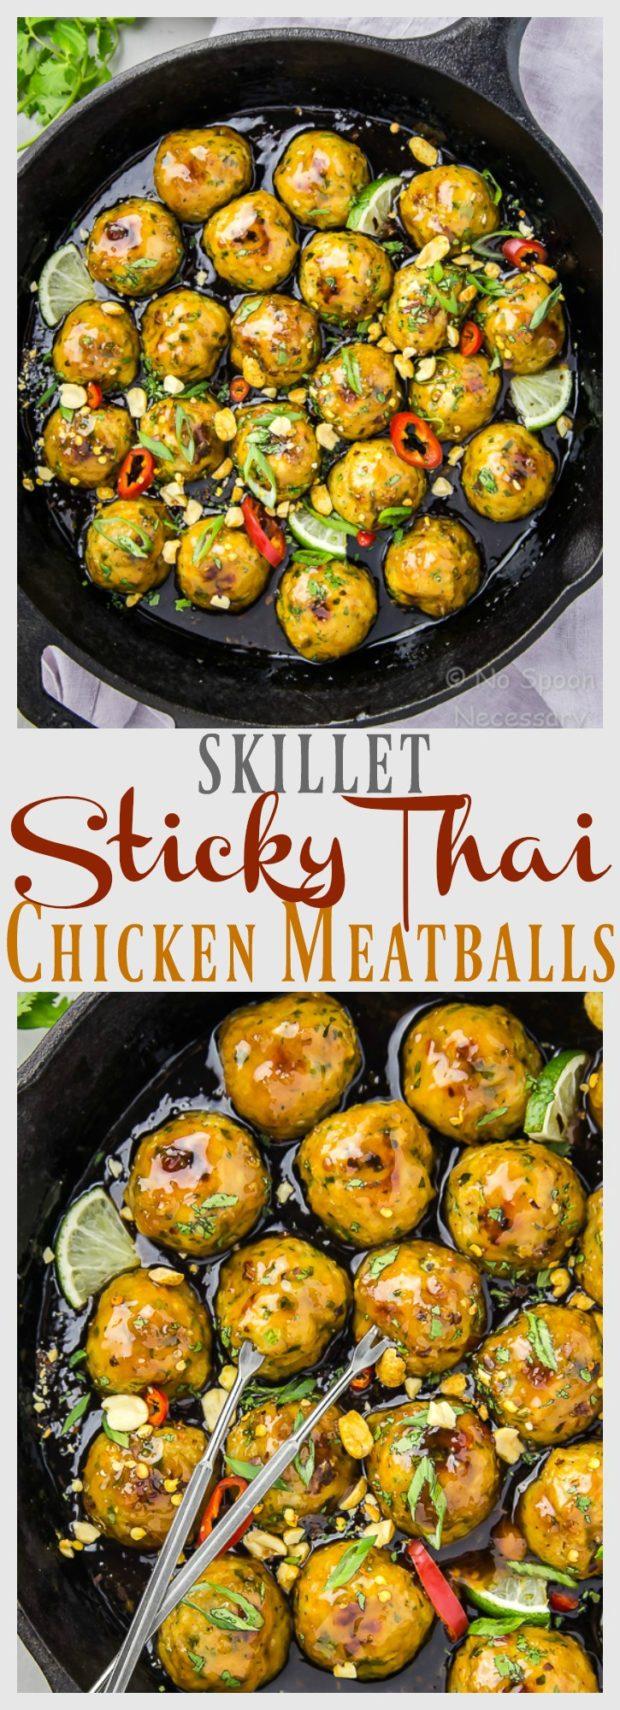 Baked Sticky Thai Chicken Meatballs